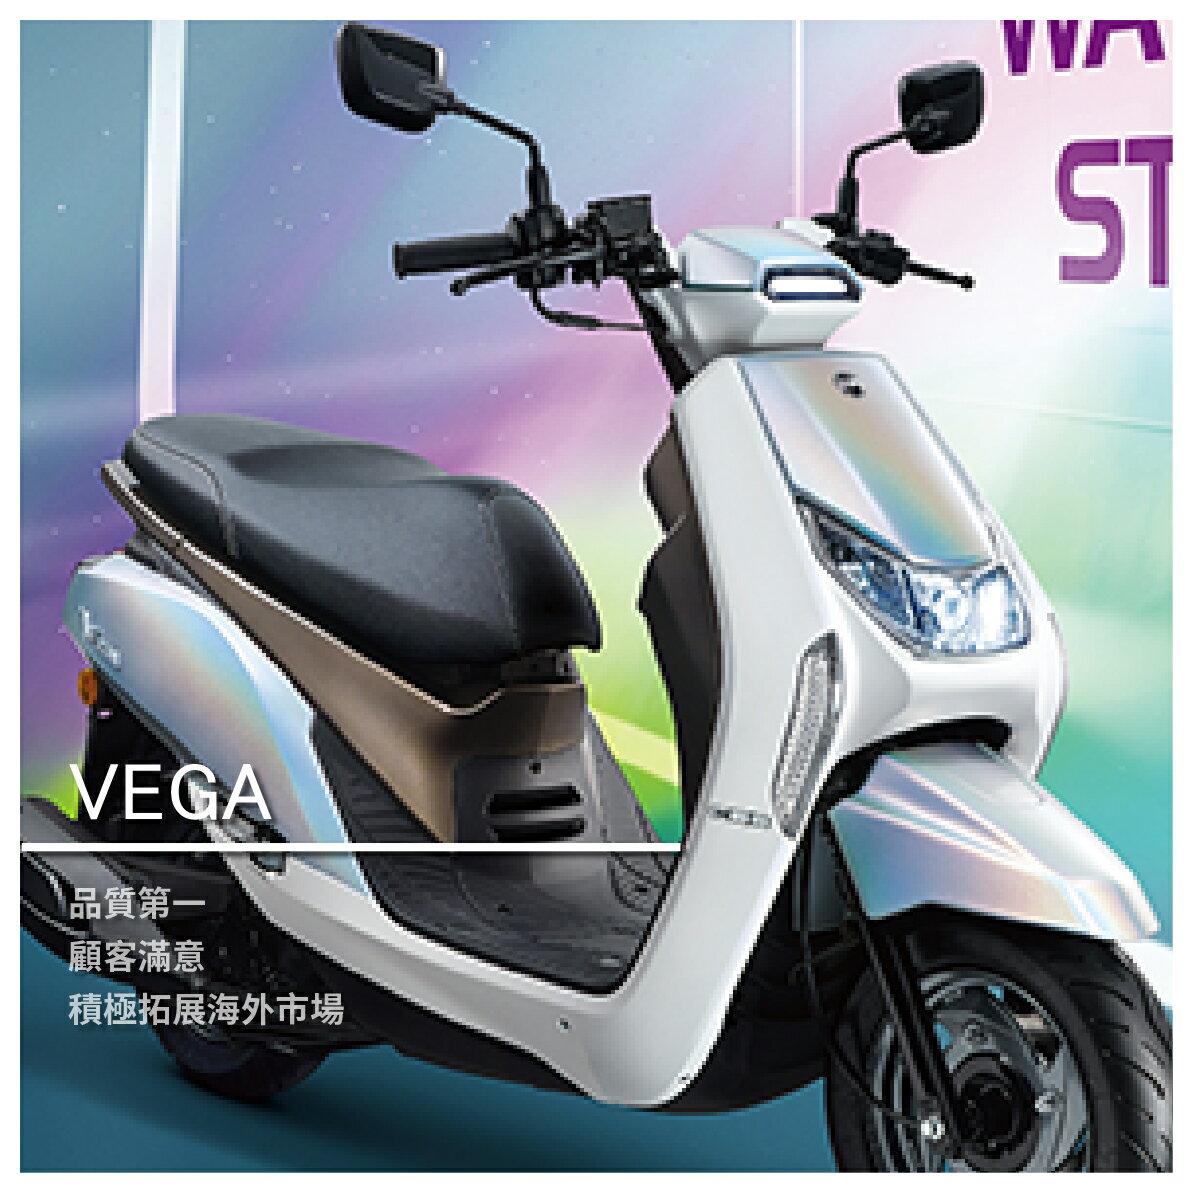 【SYM三陽機車-鋐安車業】 VEGA/73000起